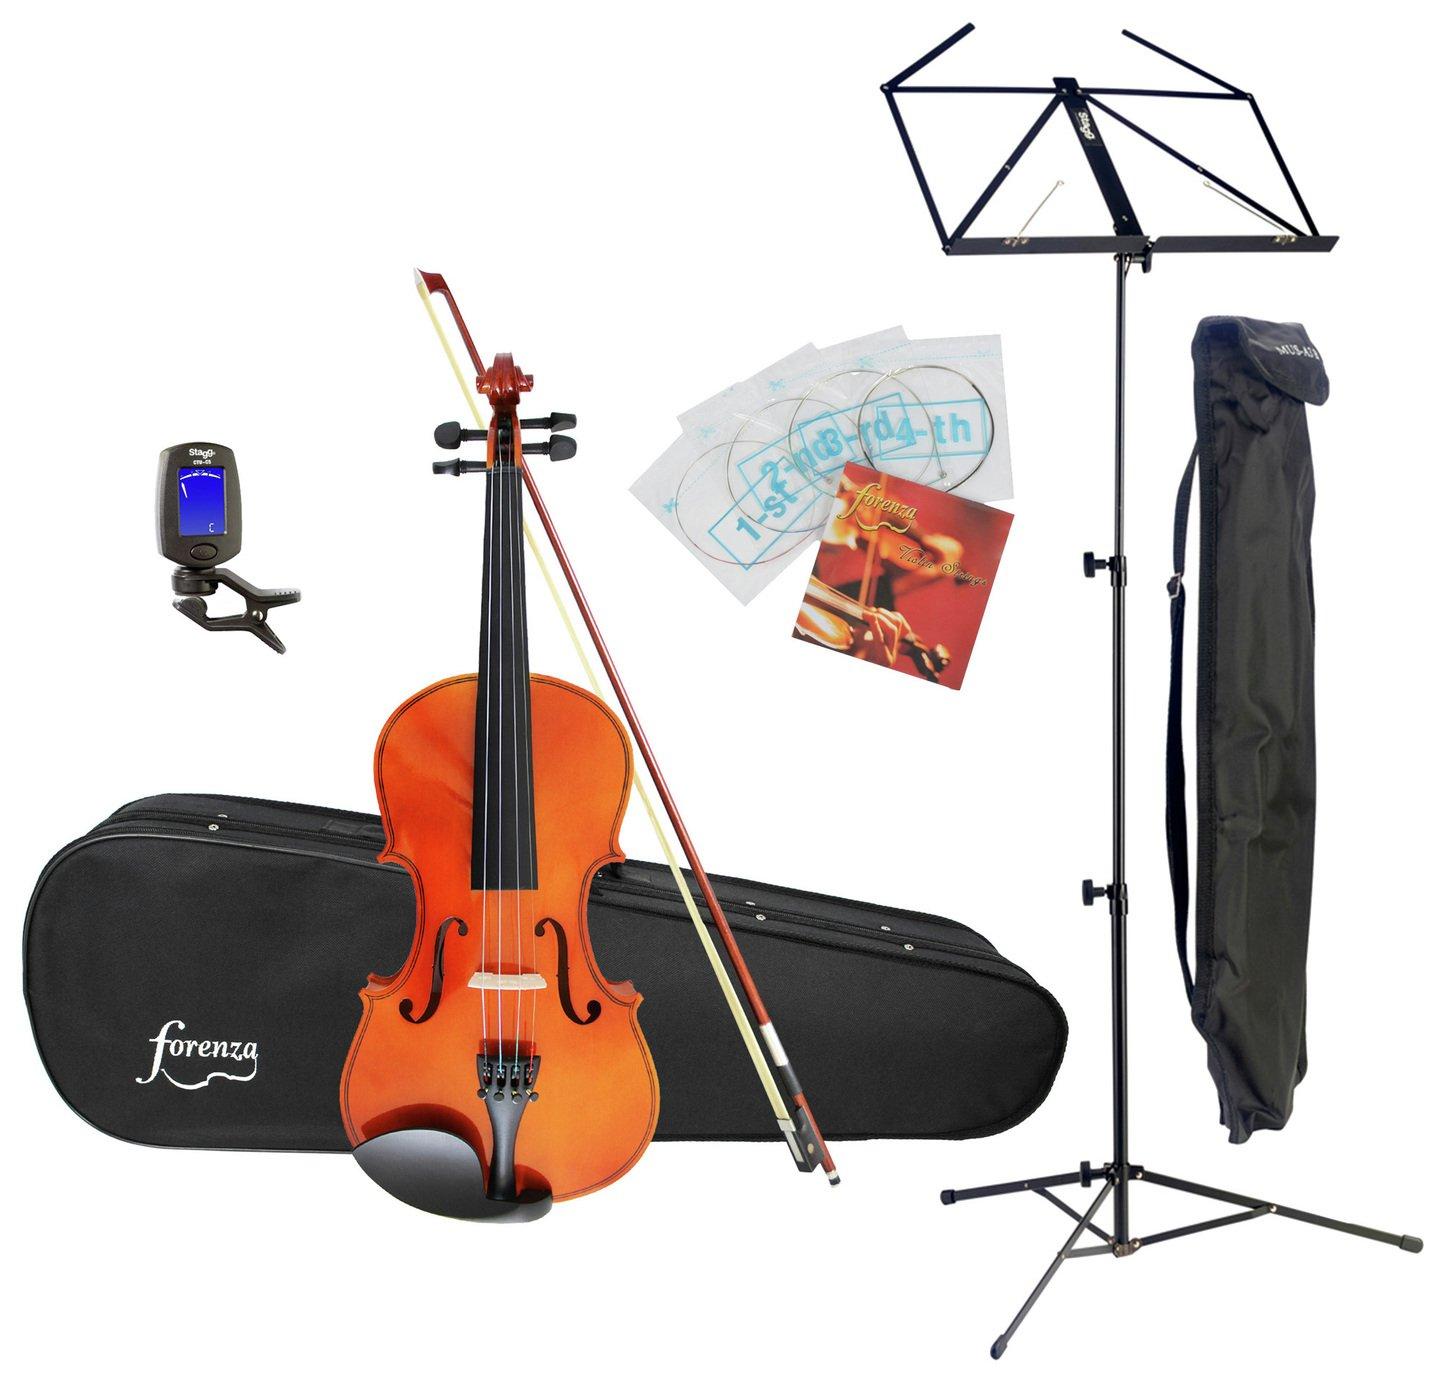 Forenza Uno Full Size Violin Starter Bundle